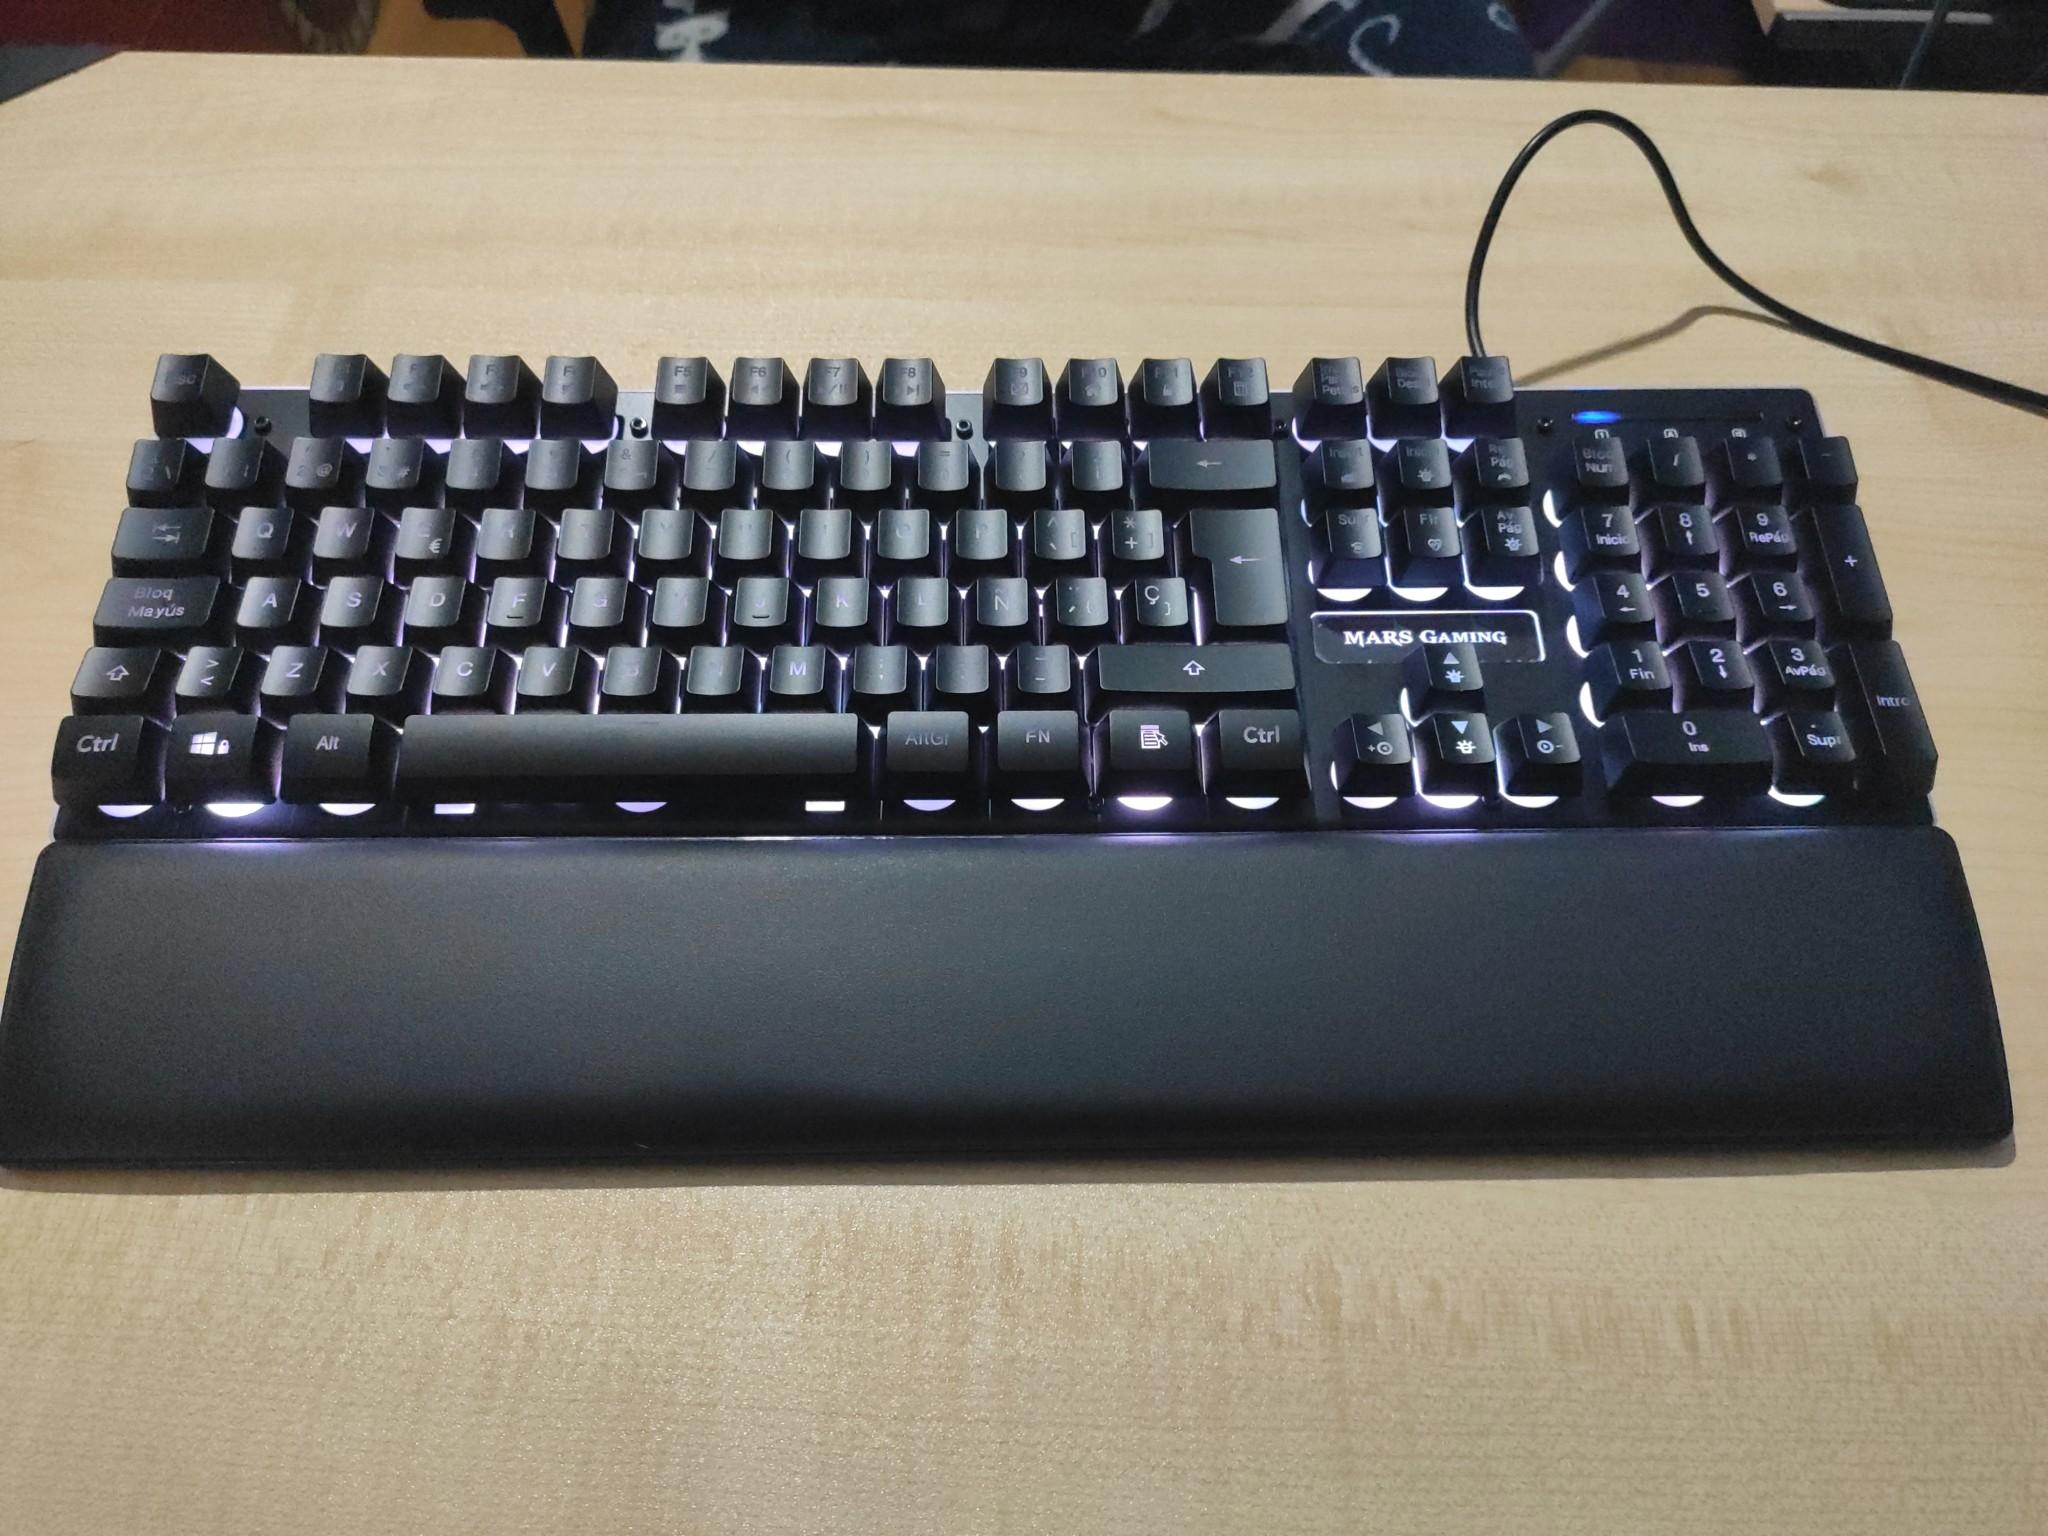 Mars Gaming MK320